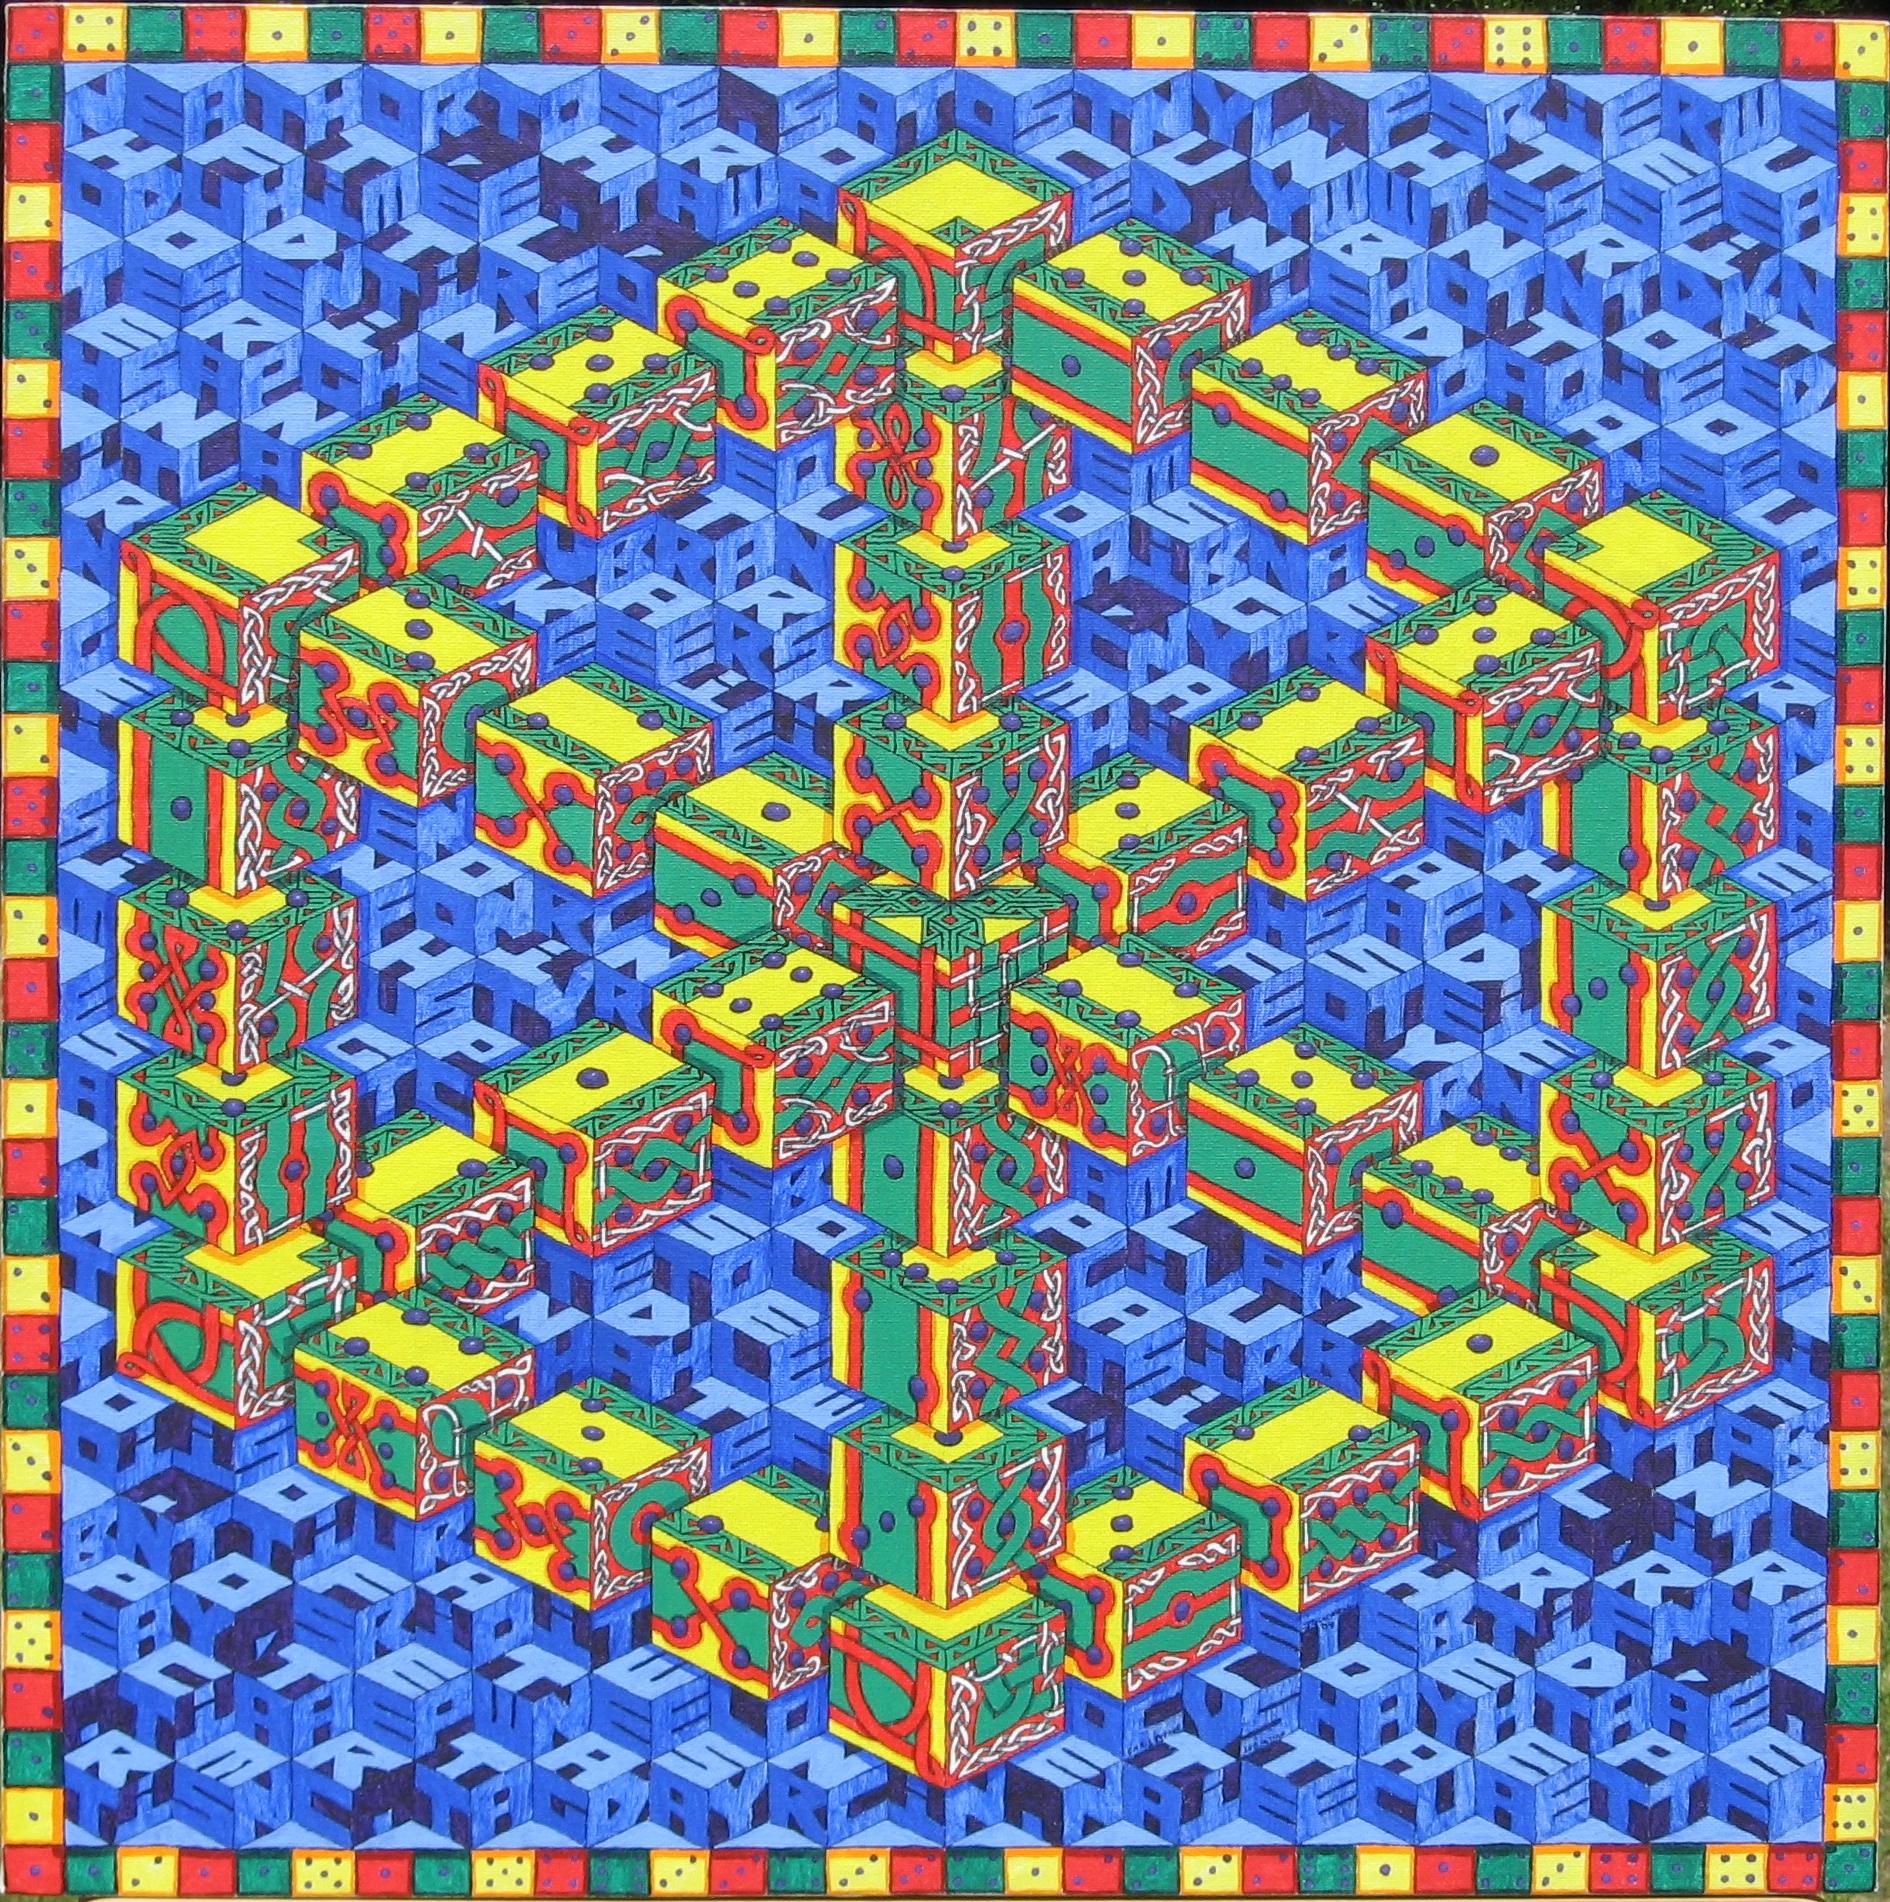 http://fc02.deviantart.net/fs22/f/2008/005/e/1/Dice_Illusion_by_herbevore.jpg